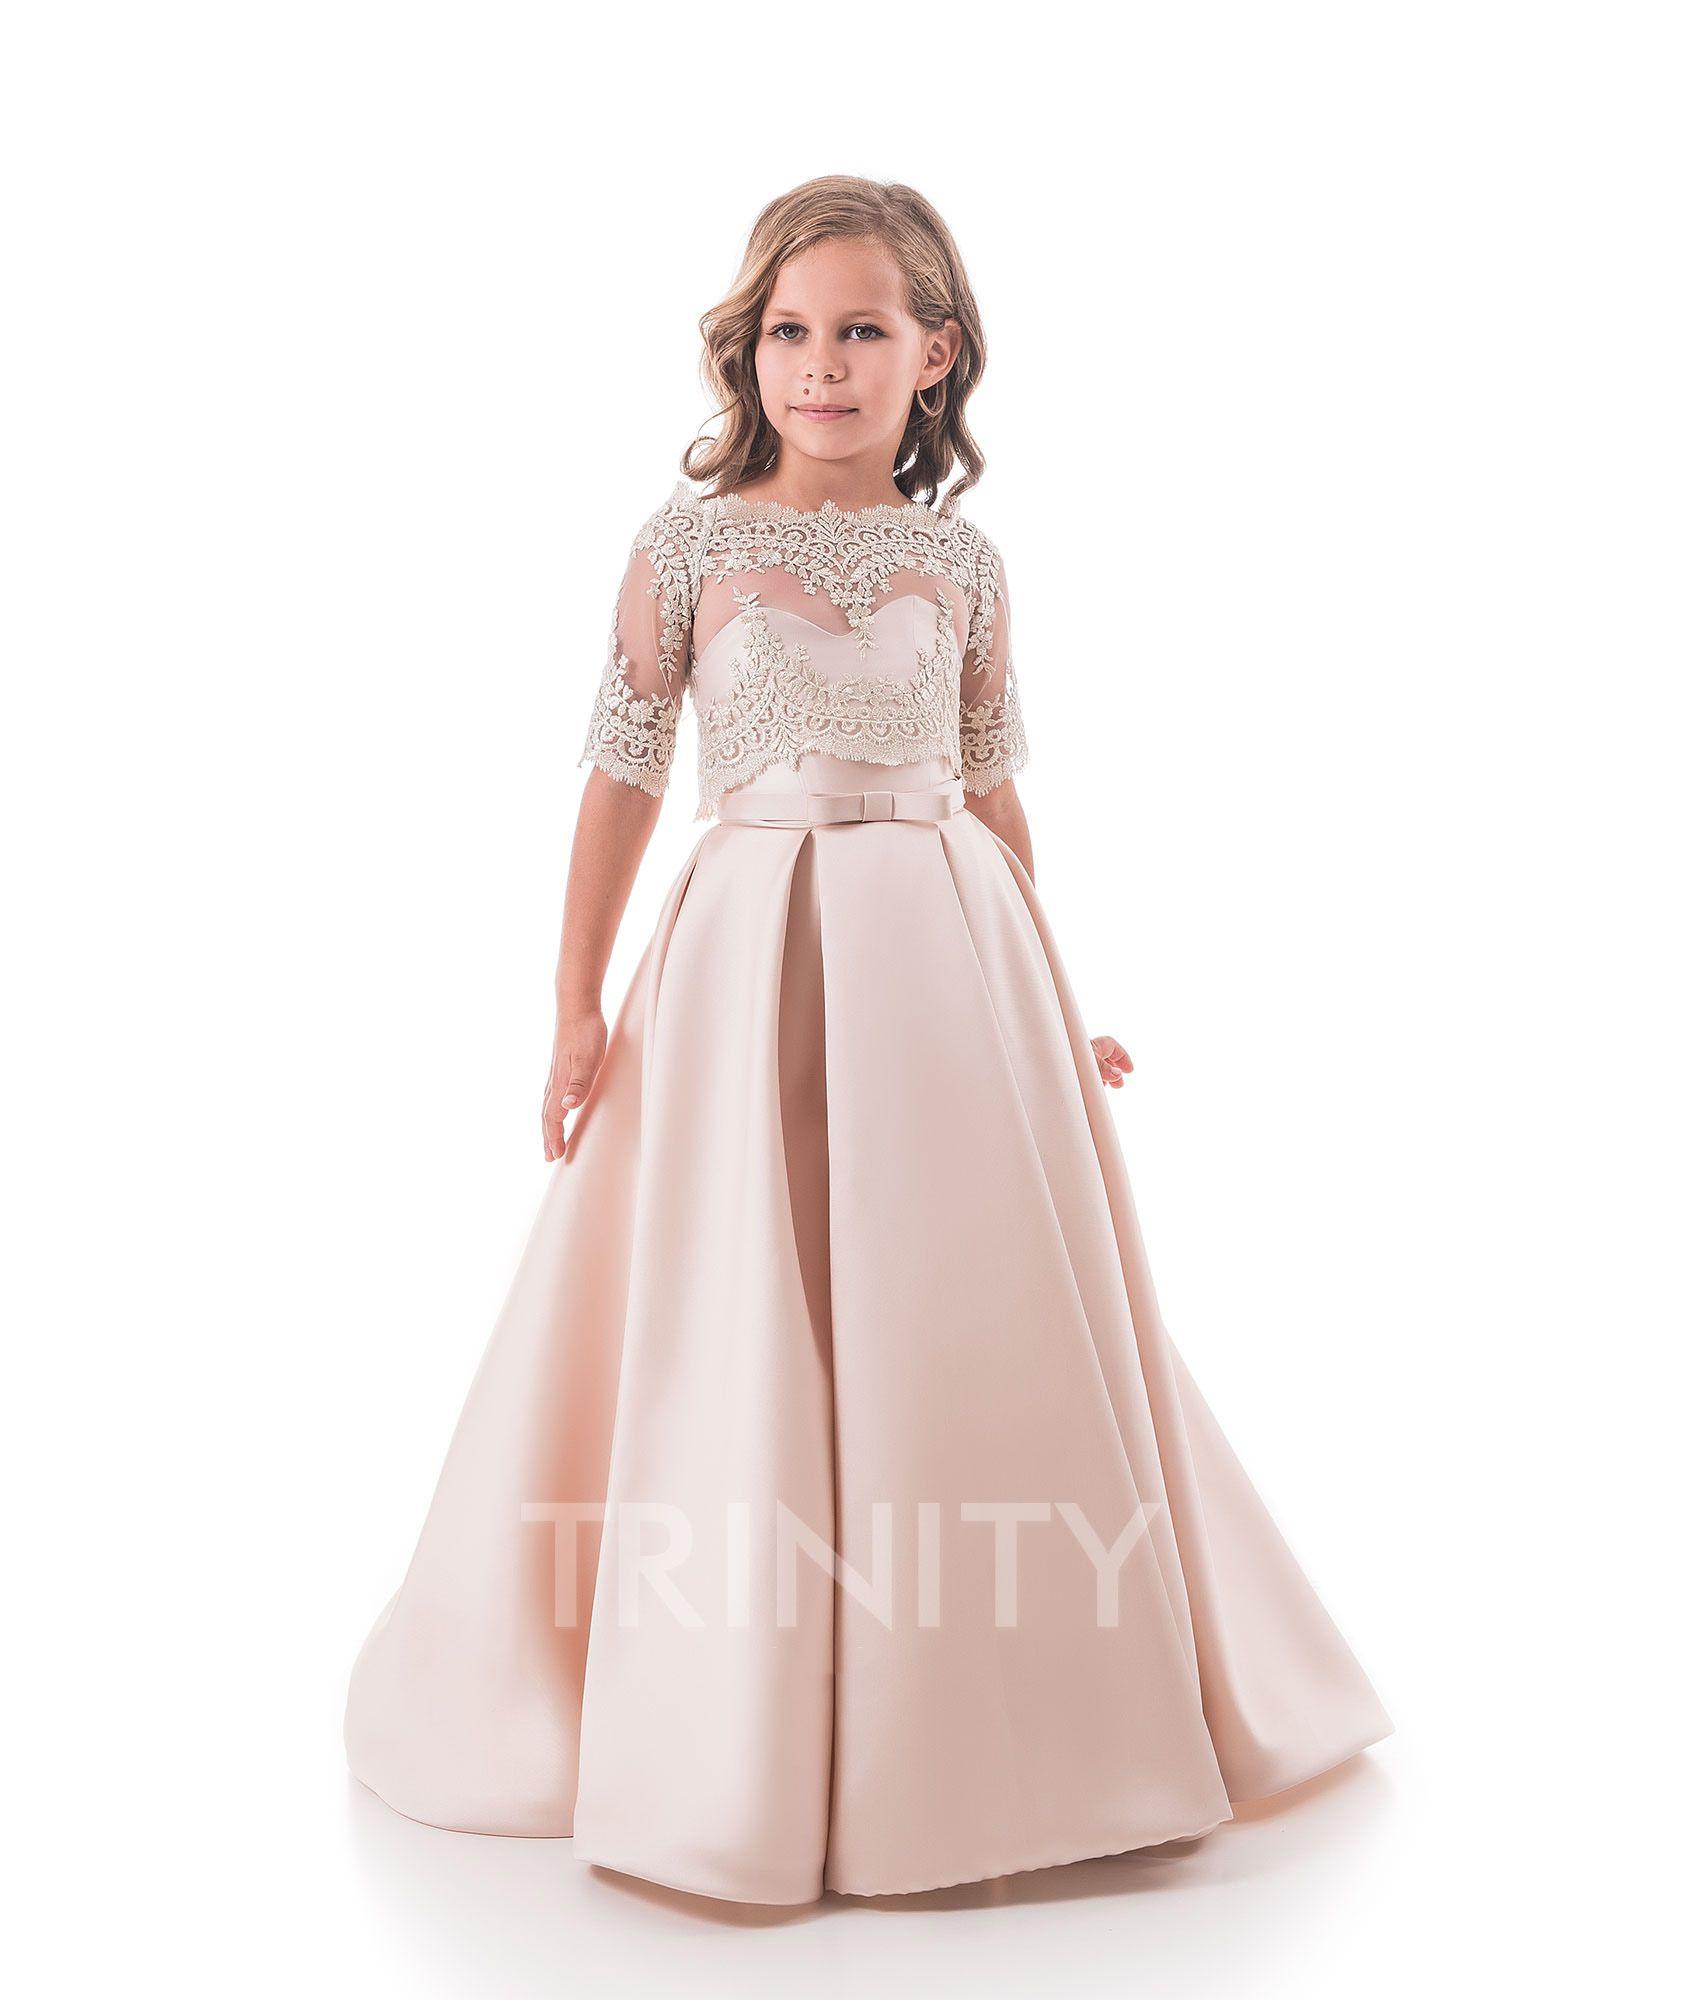 Sequin Flower Girl Dress 2-14 Birthday Pageant Holiday Graduation Bridesmaid USA